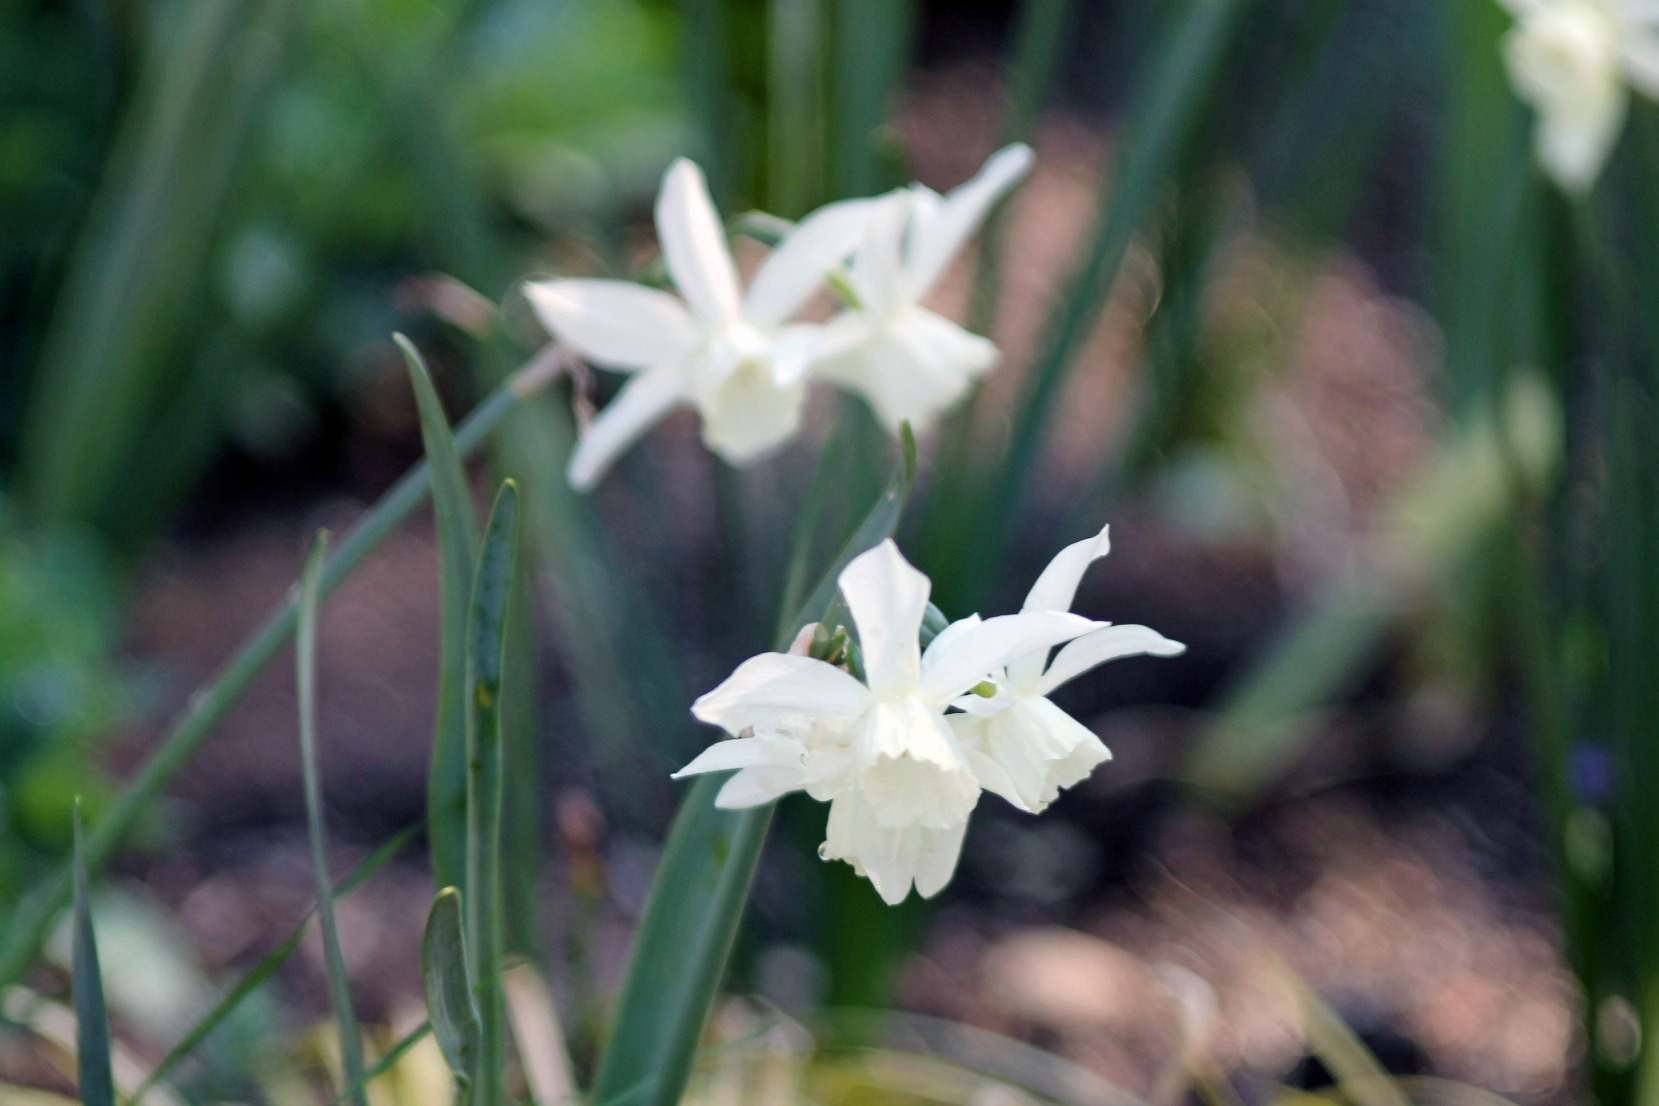 Jonquils in Bloom